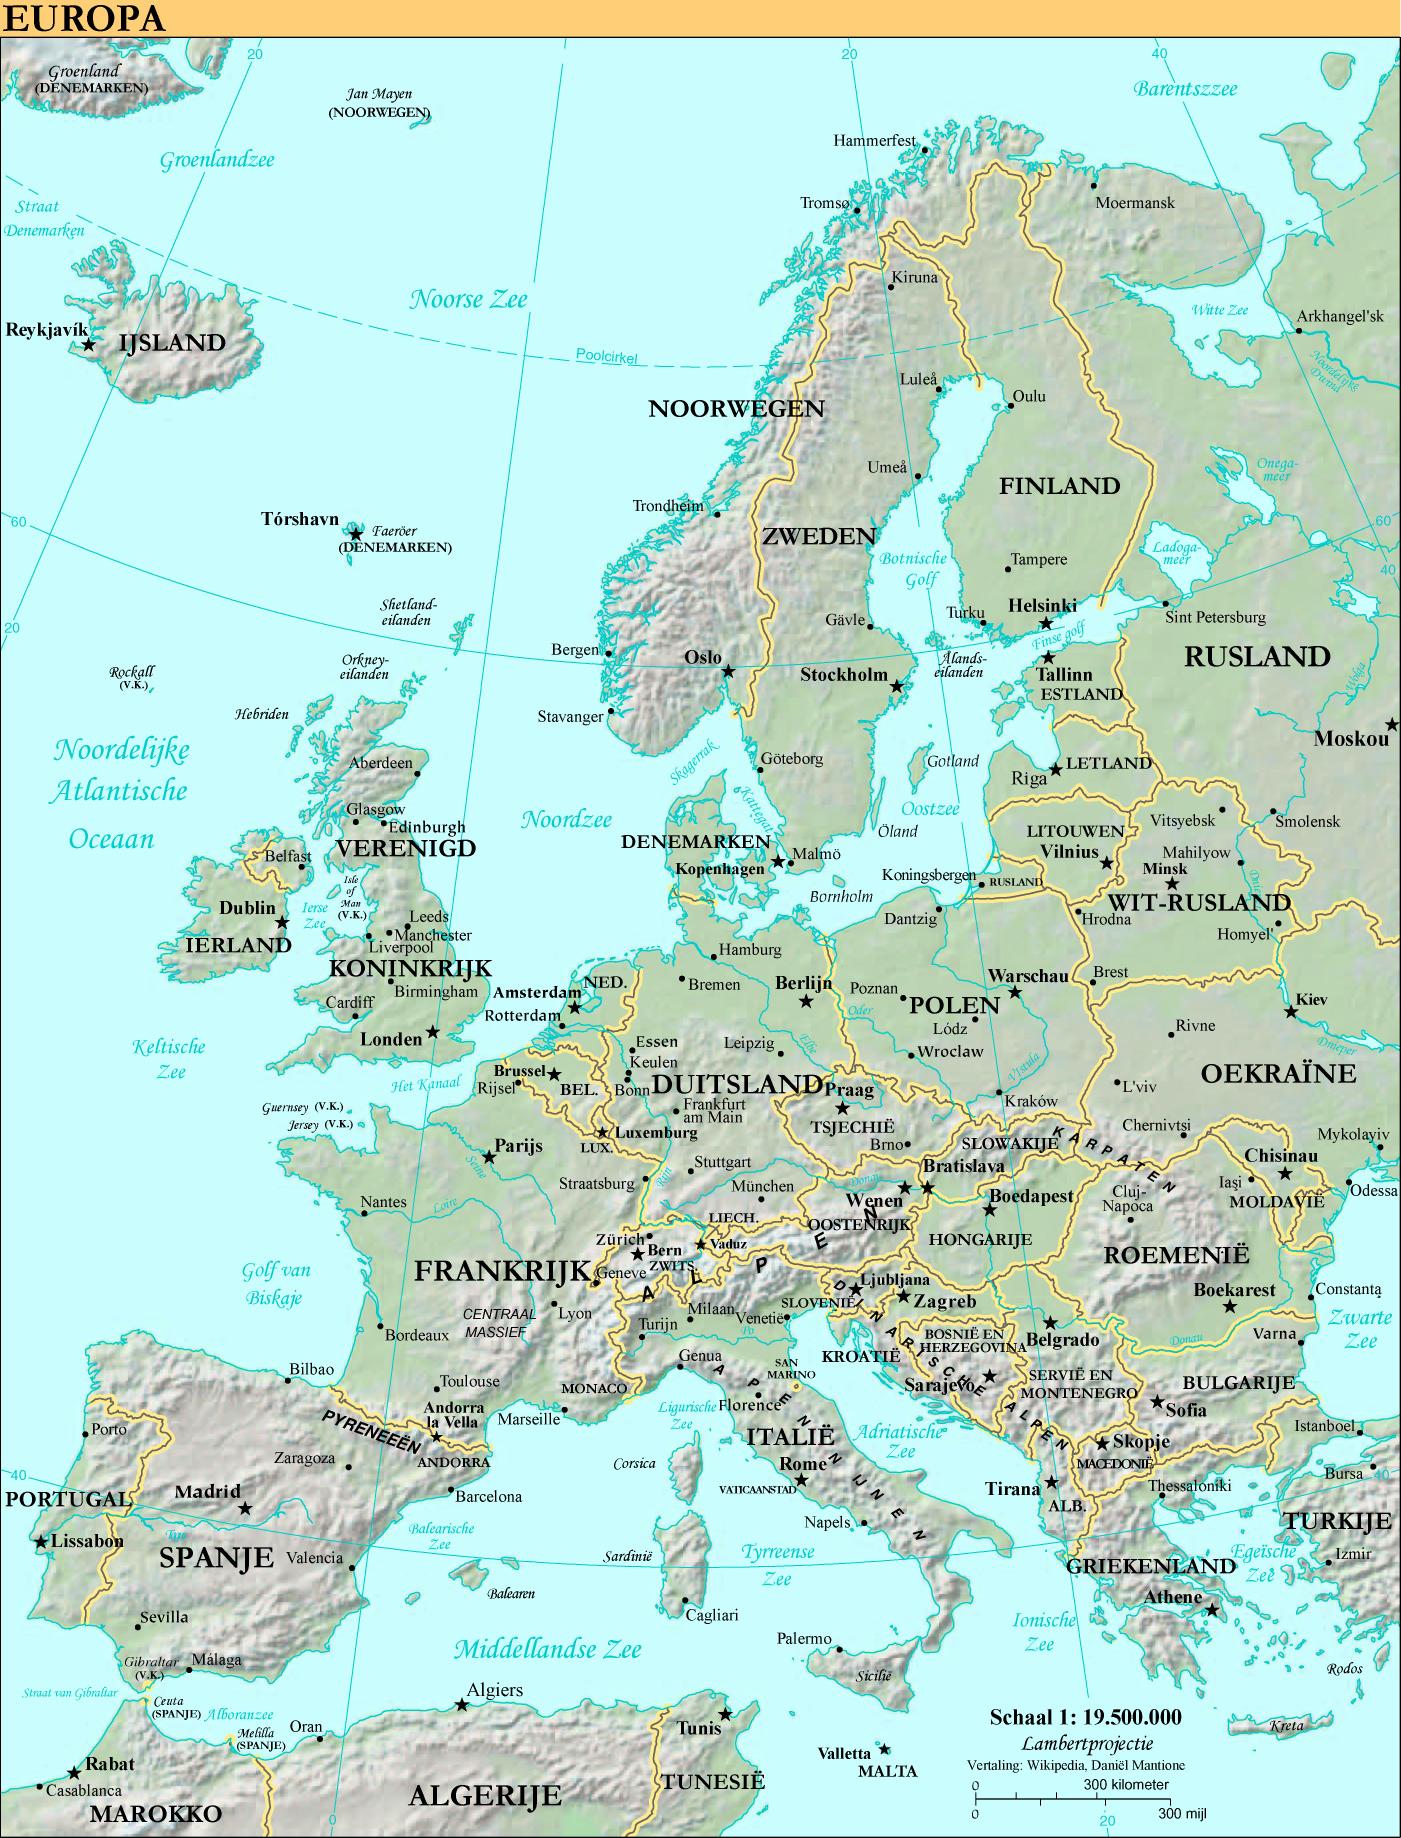 File:Kaart Europa.jpg - Wikimedia Commons